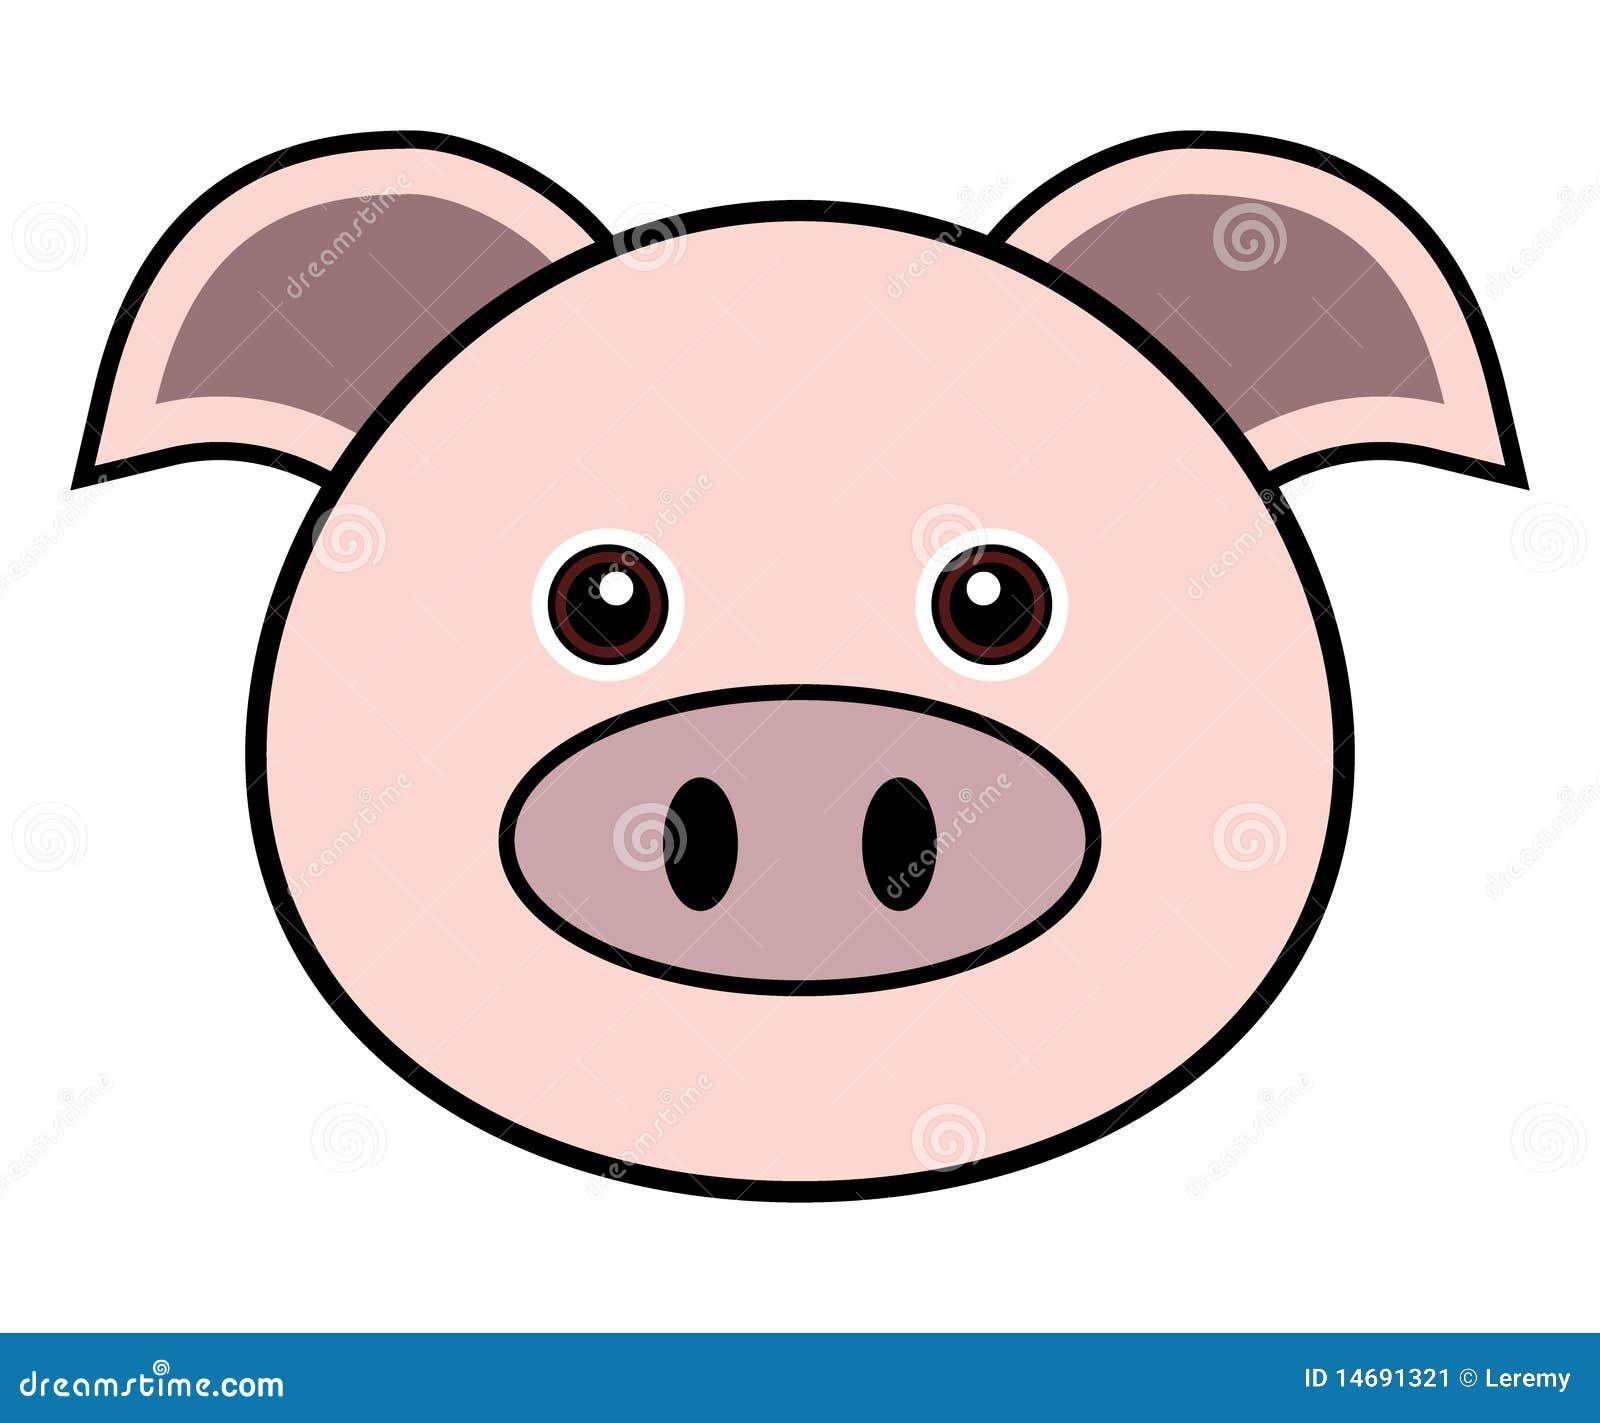 Cute Pig Vector Stock Vector Illustration Of Cute Face 14691321